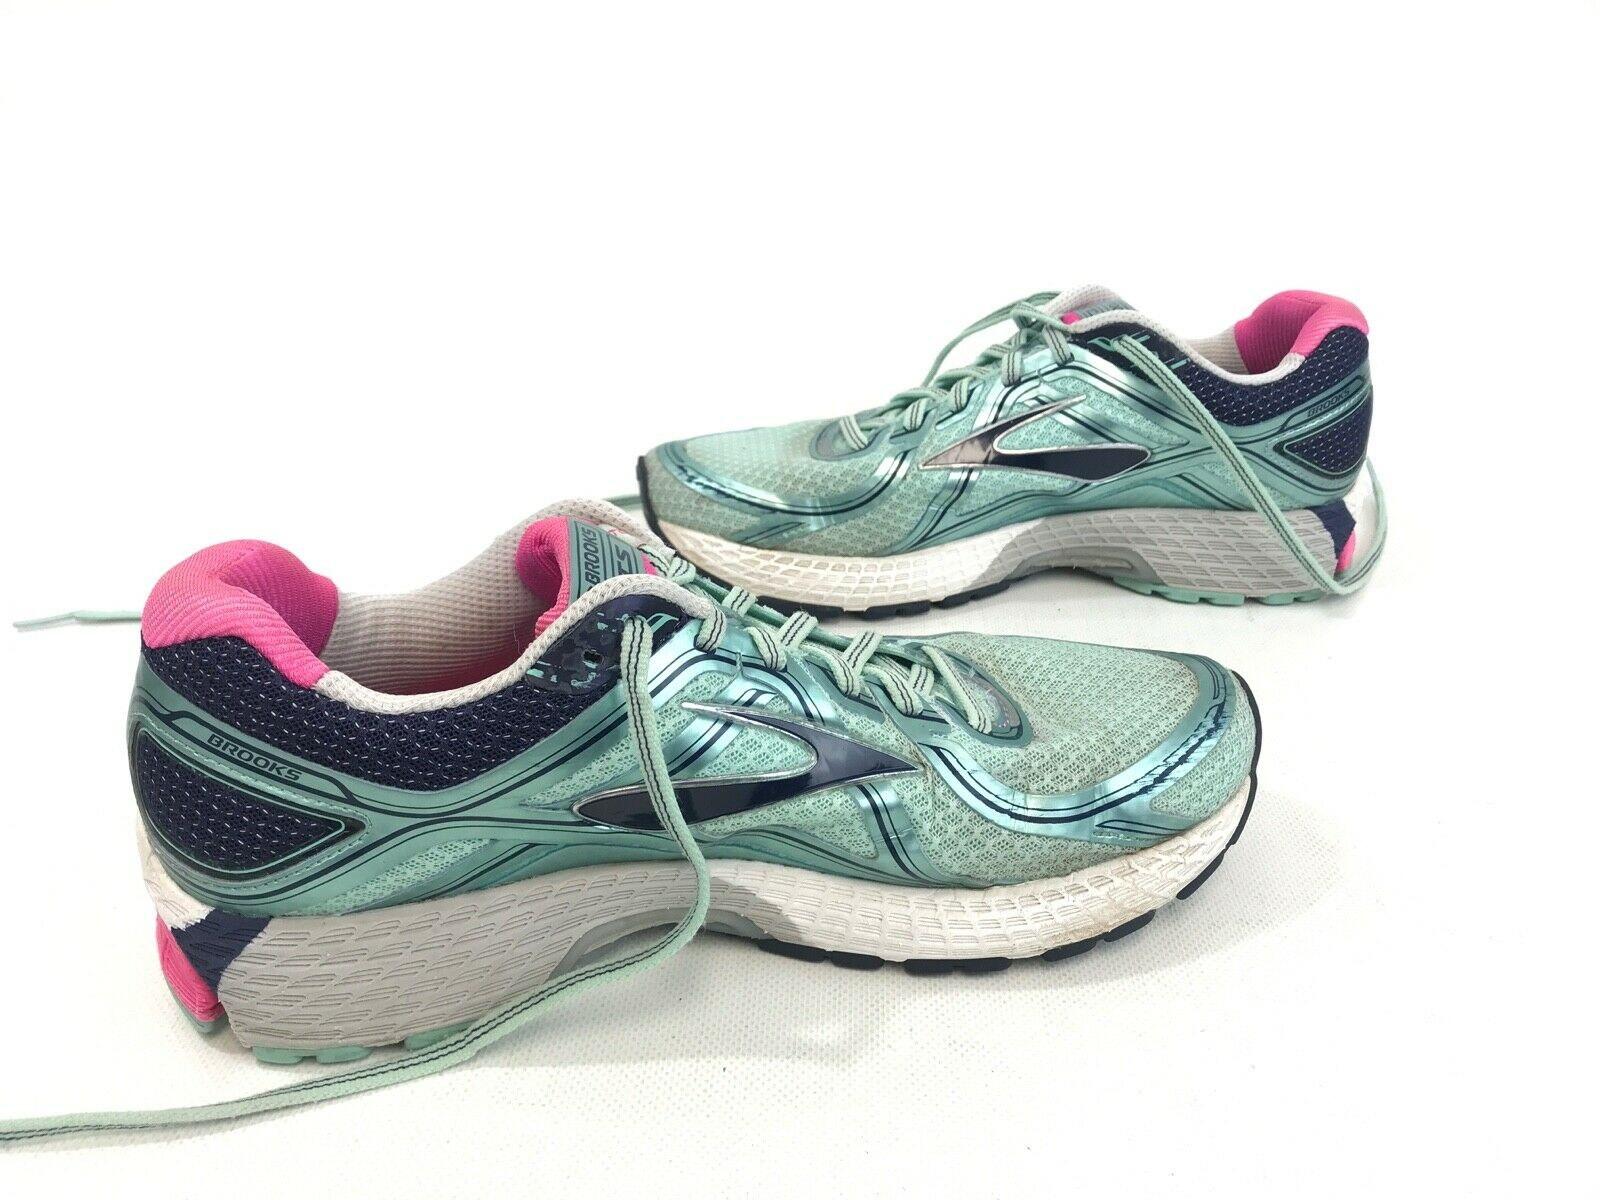 Brooks Adrenaline GTS 16 Running shoes Women Size 11 M Turquoise Pink EUC